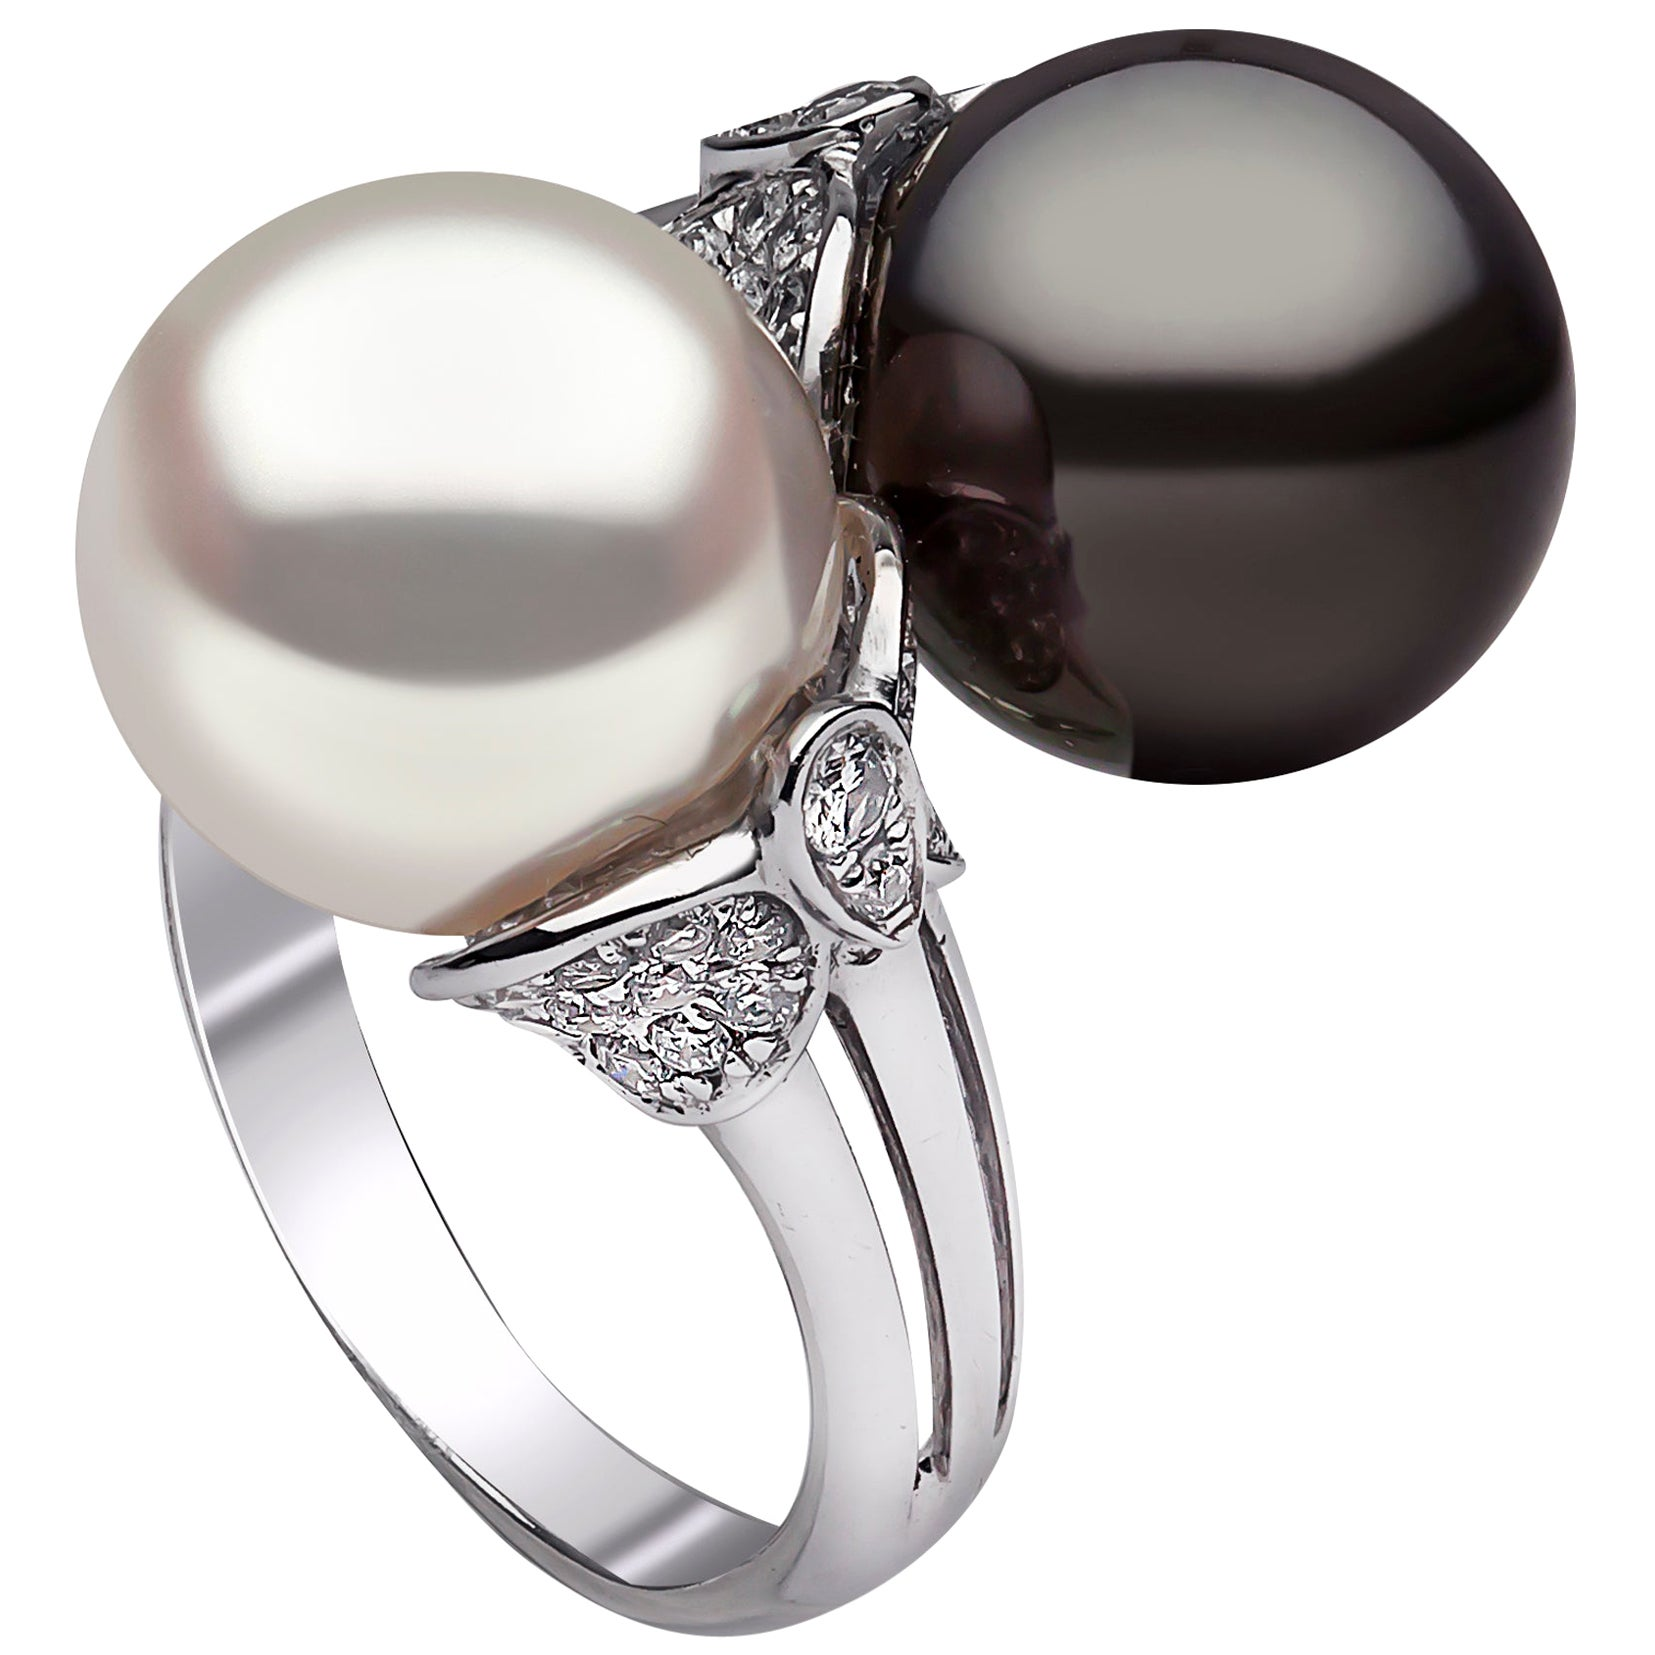 Yoko London Tahitian, South Sea Pearl and Diamond Ring in 18 Karat White Gold